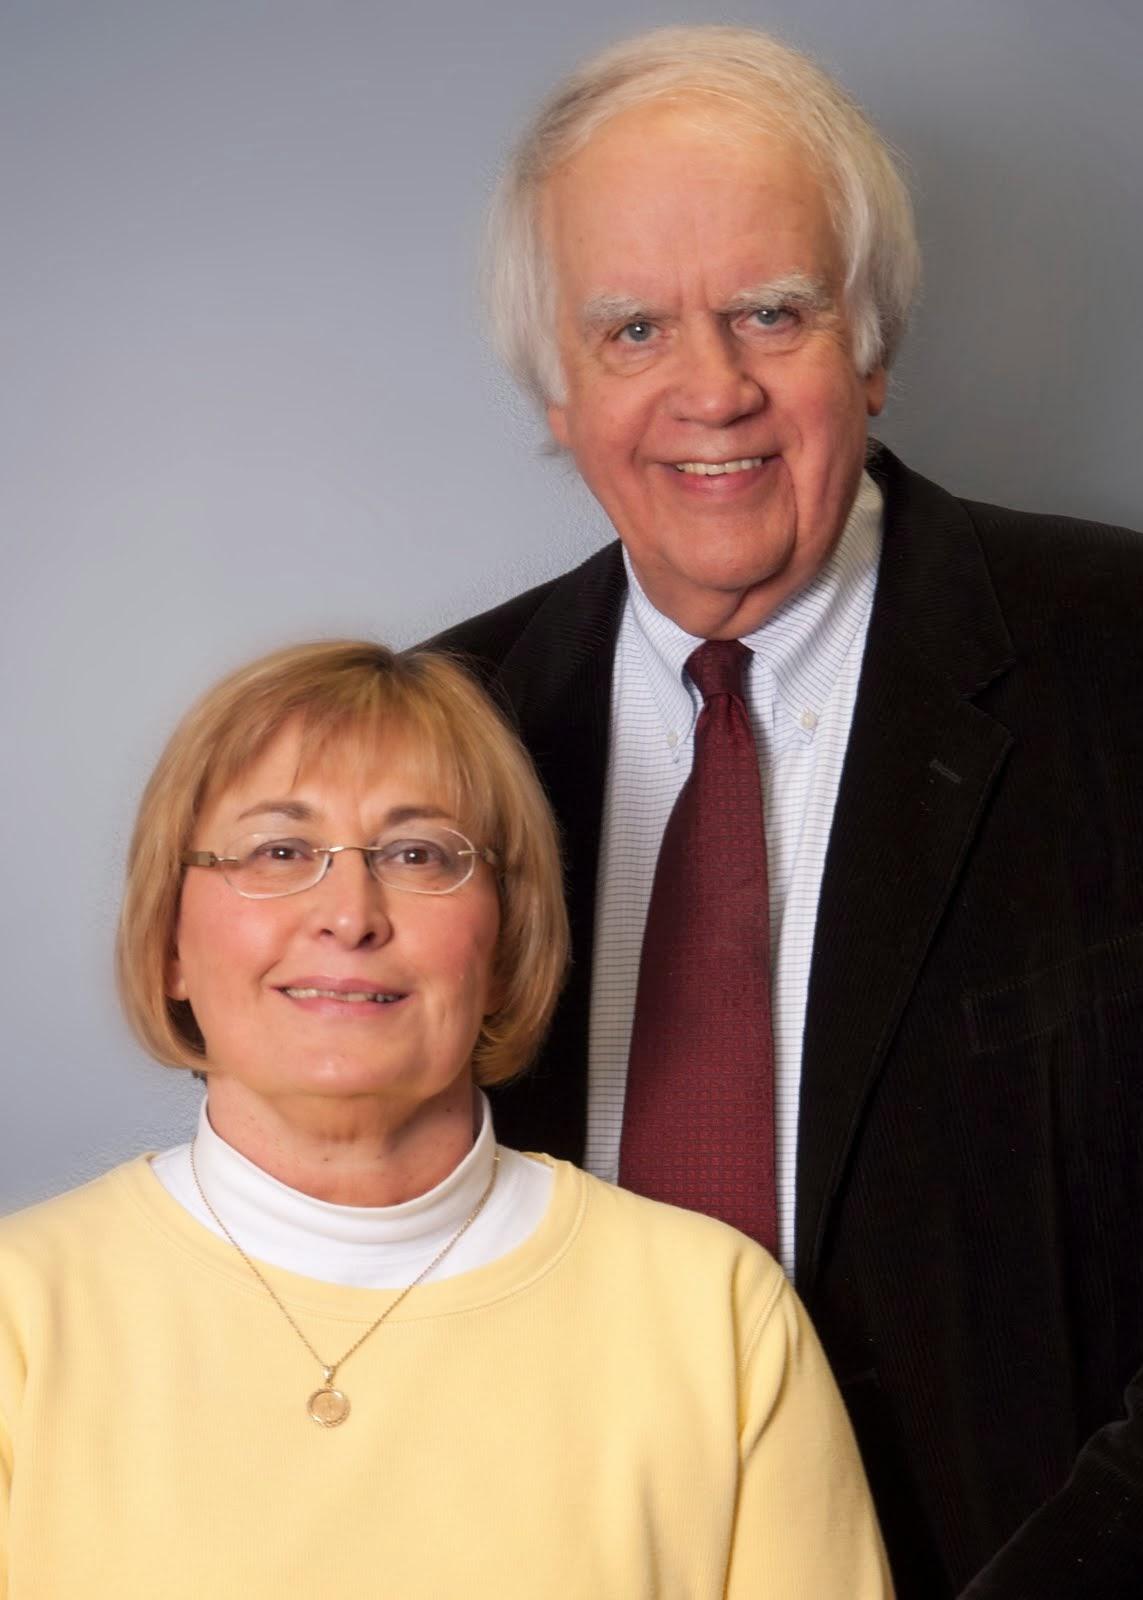 PASTOR DAVID AND JAYNE